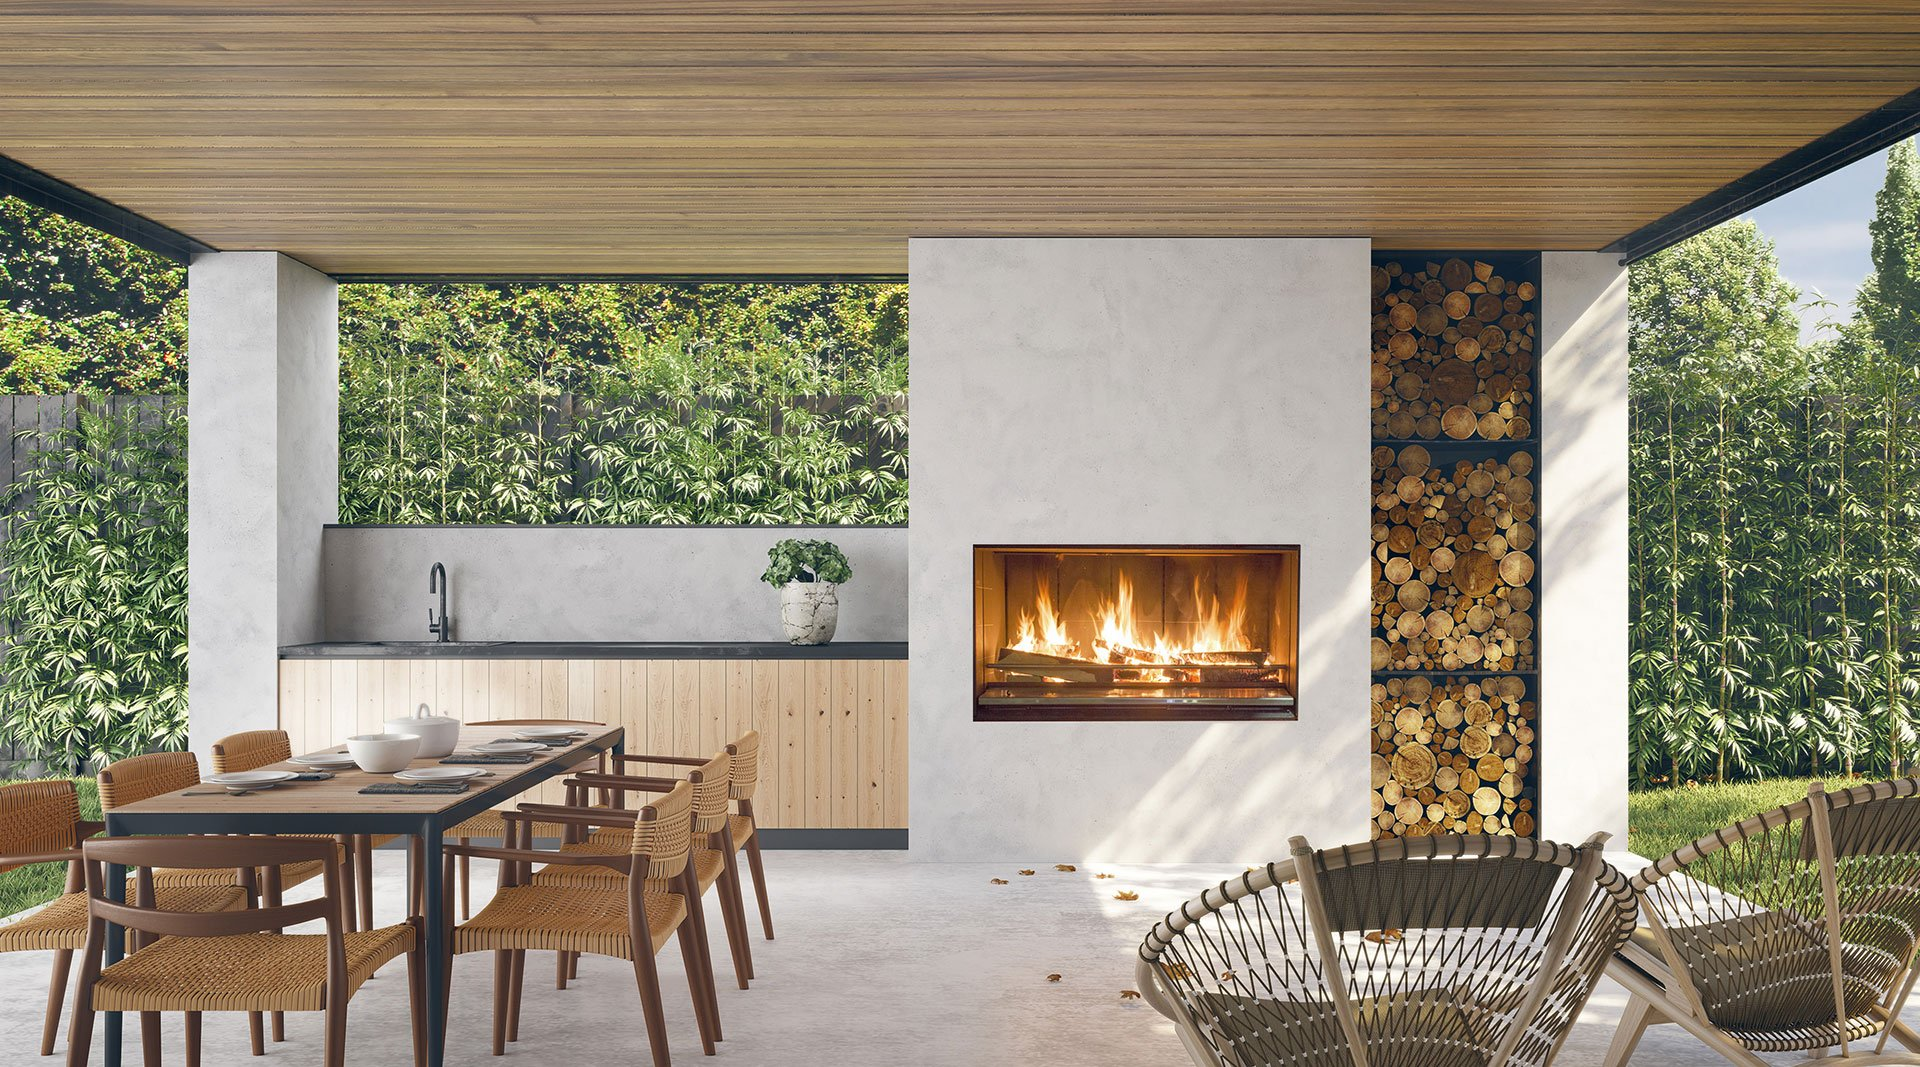 Double Sided Fireplace Range Escea Fireplaces Australia